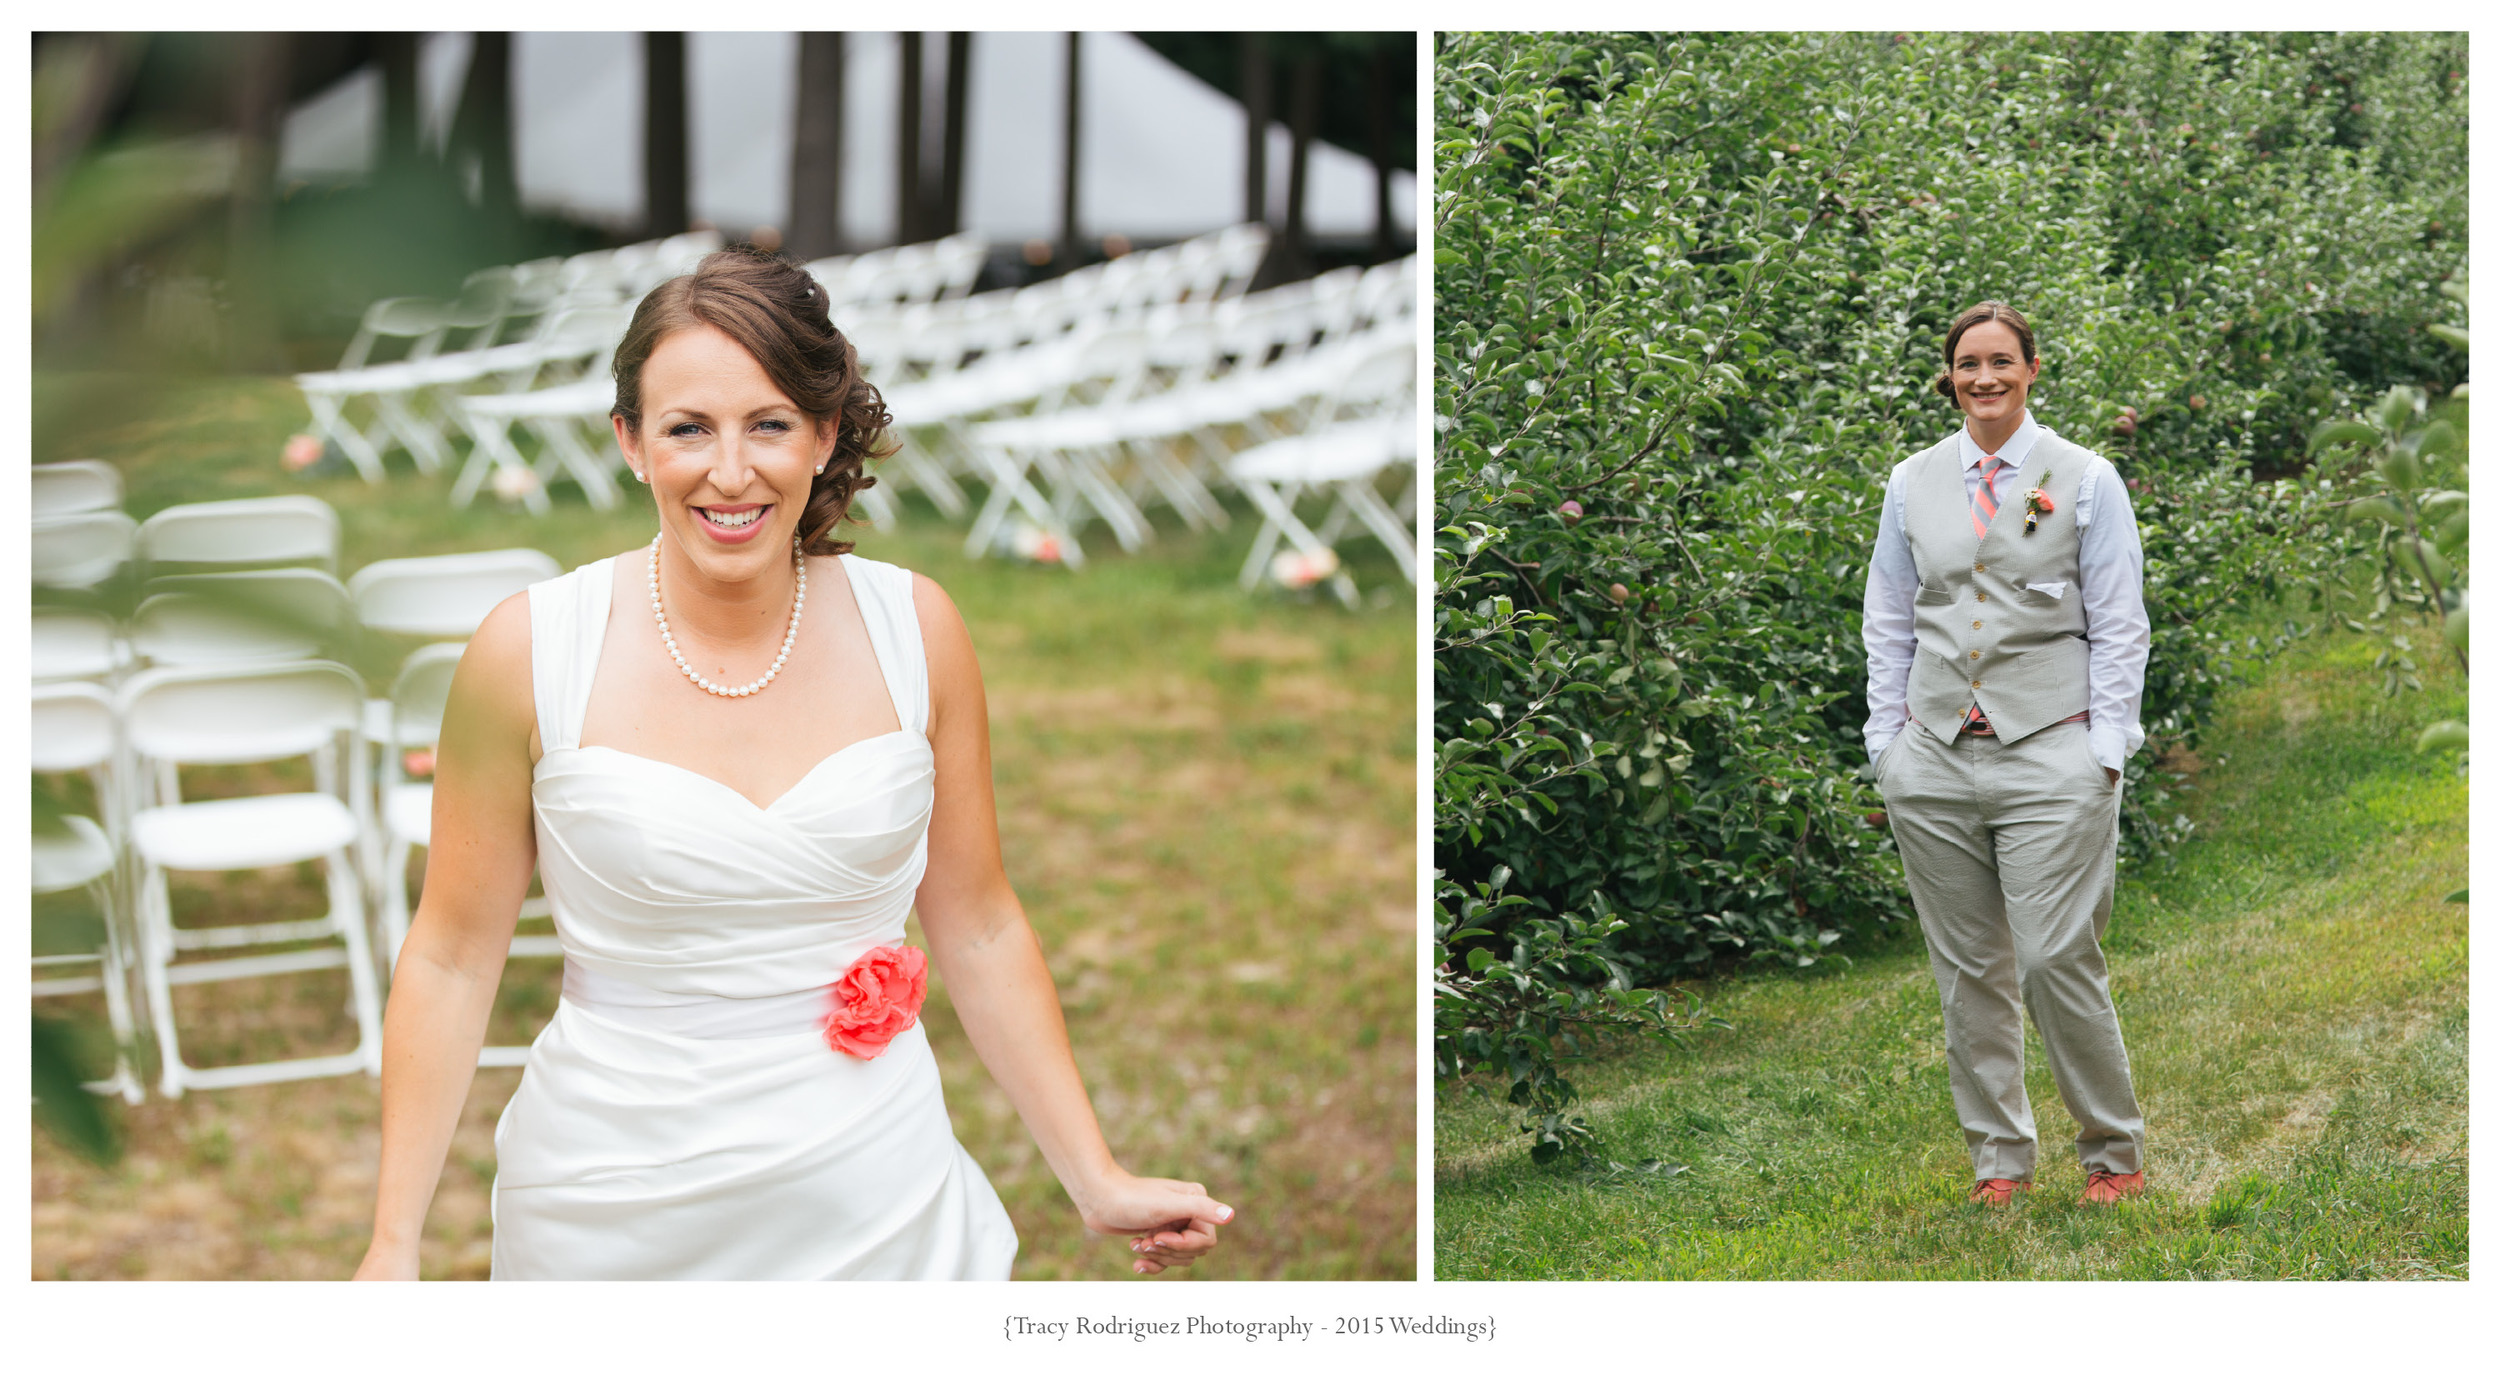 Slackberg Mock Wedding Album6.jpg